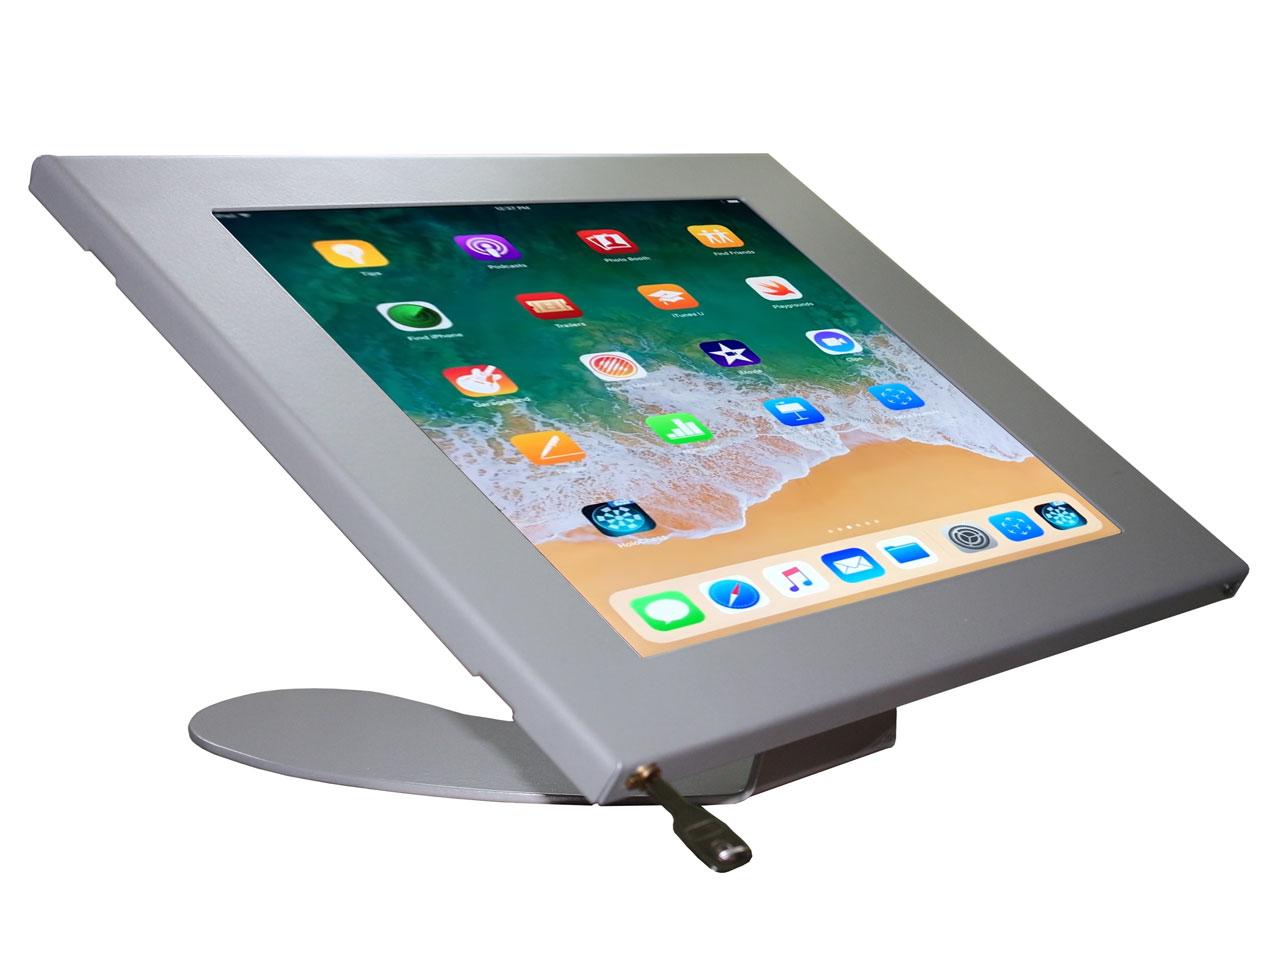 tablet schutzgeh use apple ipad pro 10 5 zoll g nstig. Black Bedroom Furniture Sets. Home Design Ideas